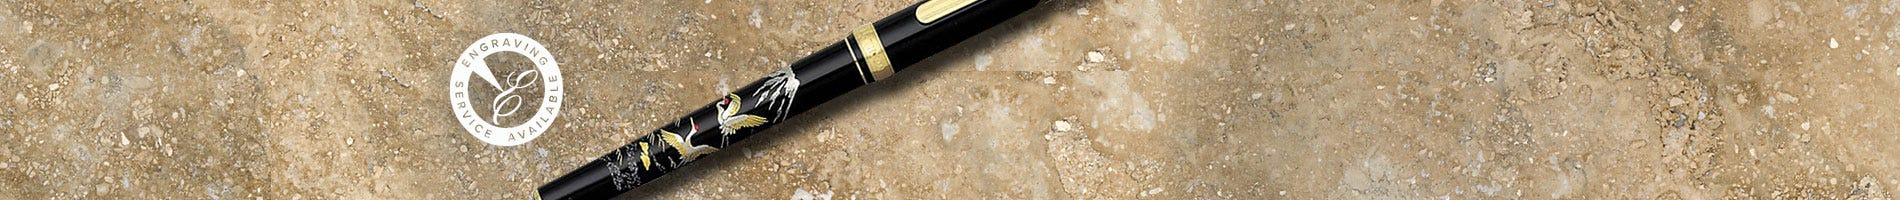 Platinum rollerball pen decorated with Japanese Maki-e design